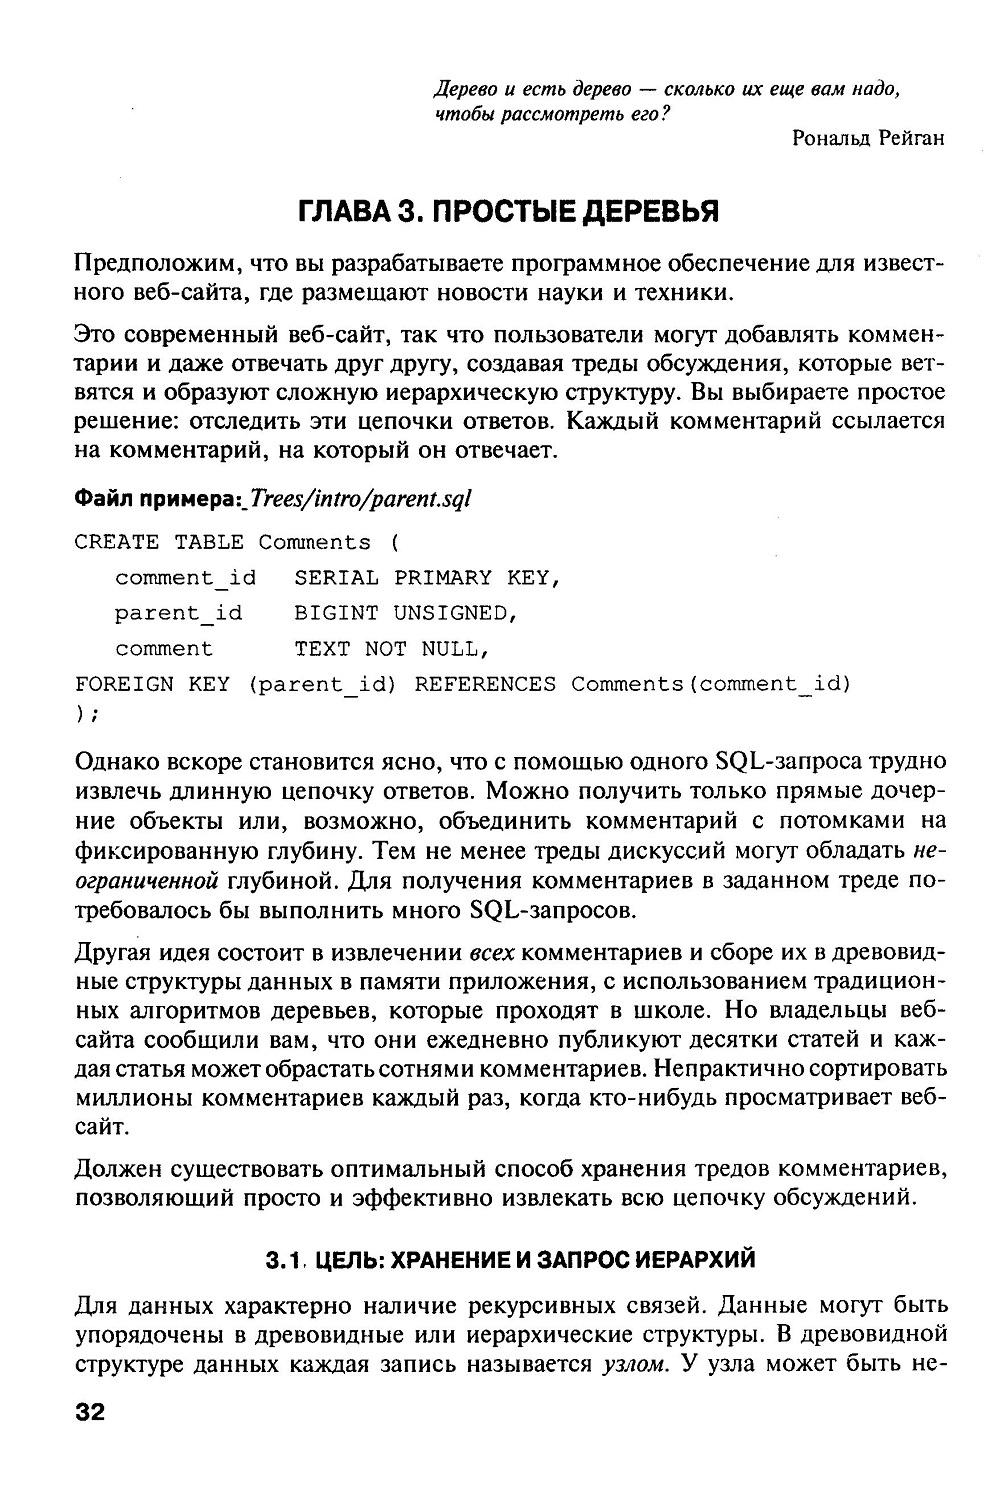 http://i1.imageban.ru/out/2014/01/20/dfefc33ae52ed1fbc9374c81949ea74a.jpg